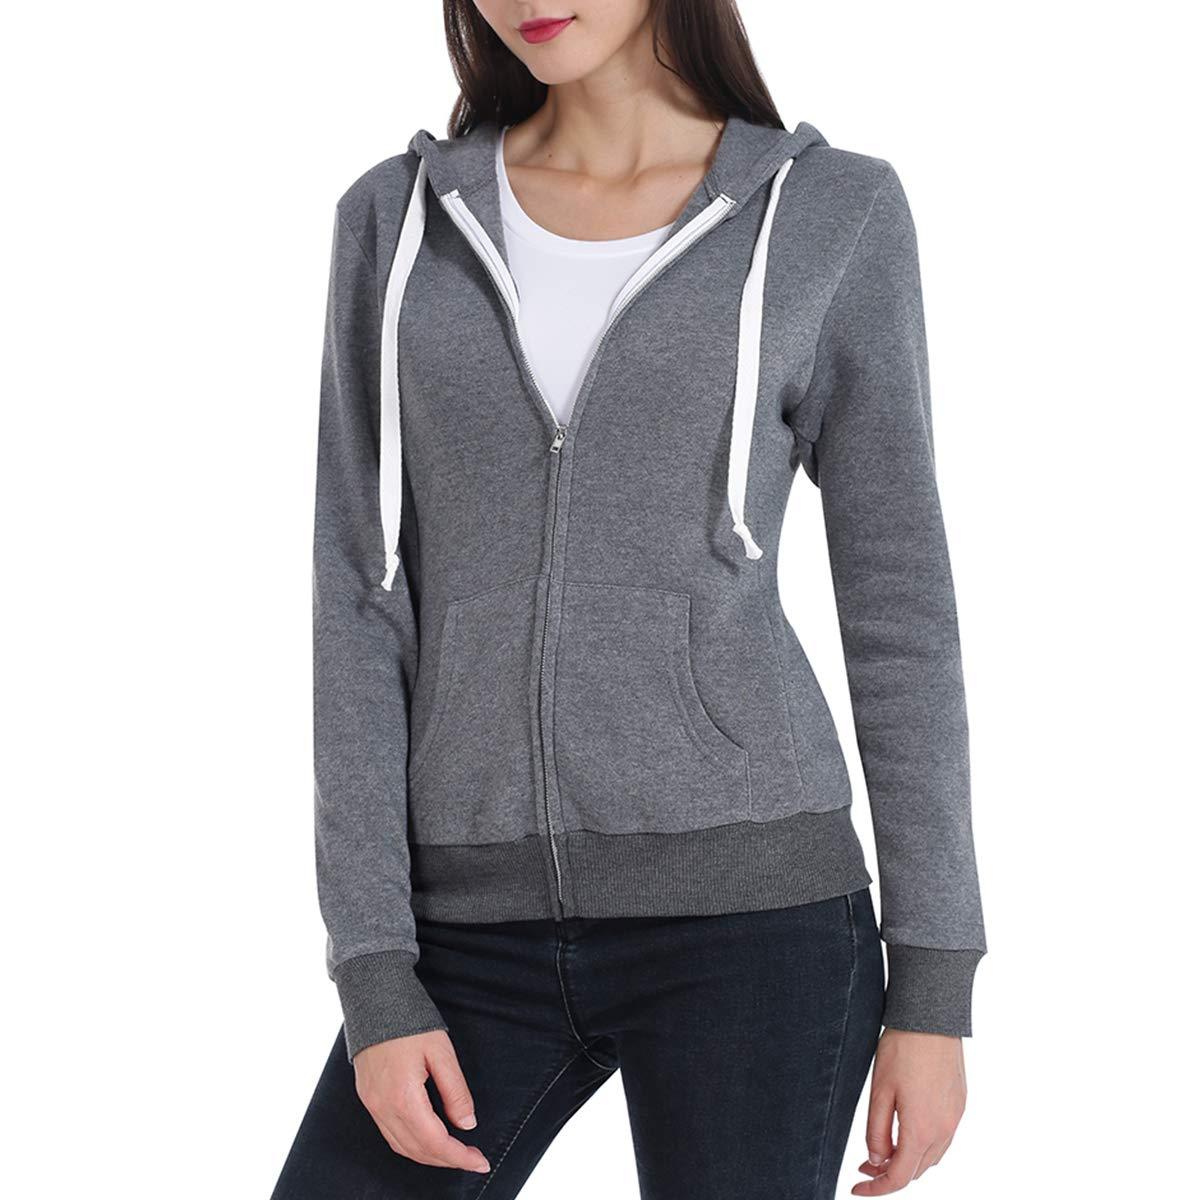 JTANIB Womens Oversized Double Fuzzy Fleece Hoodies Zipper Casual Sherpa Pullover Hooded Sweatshirt with Pocket